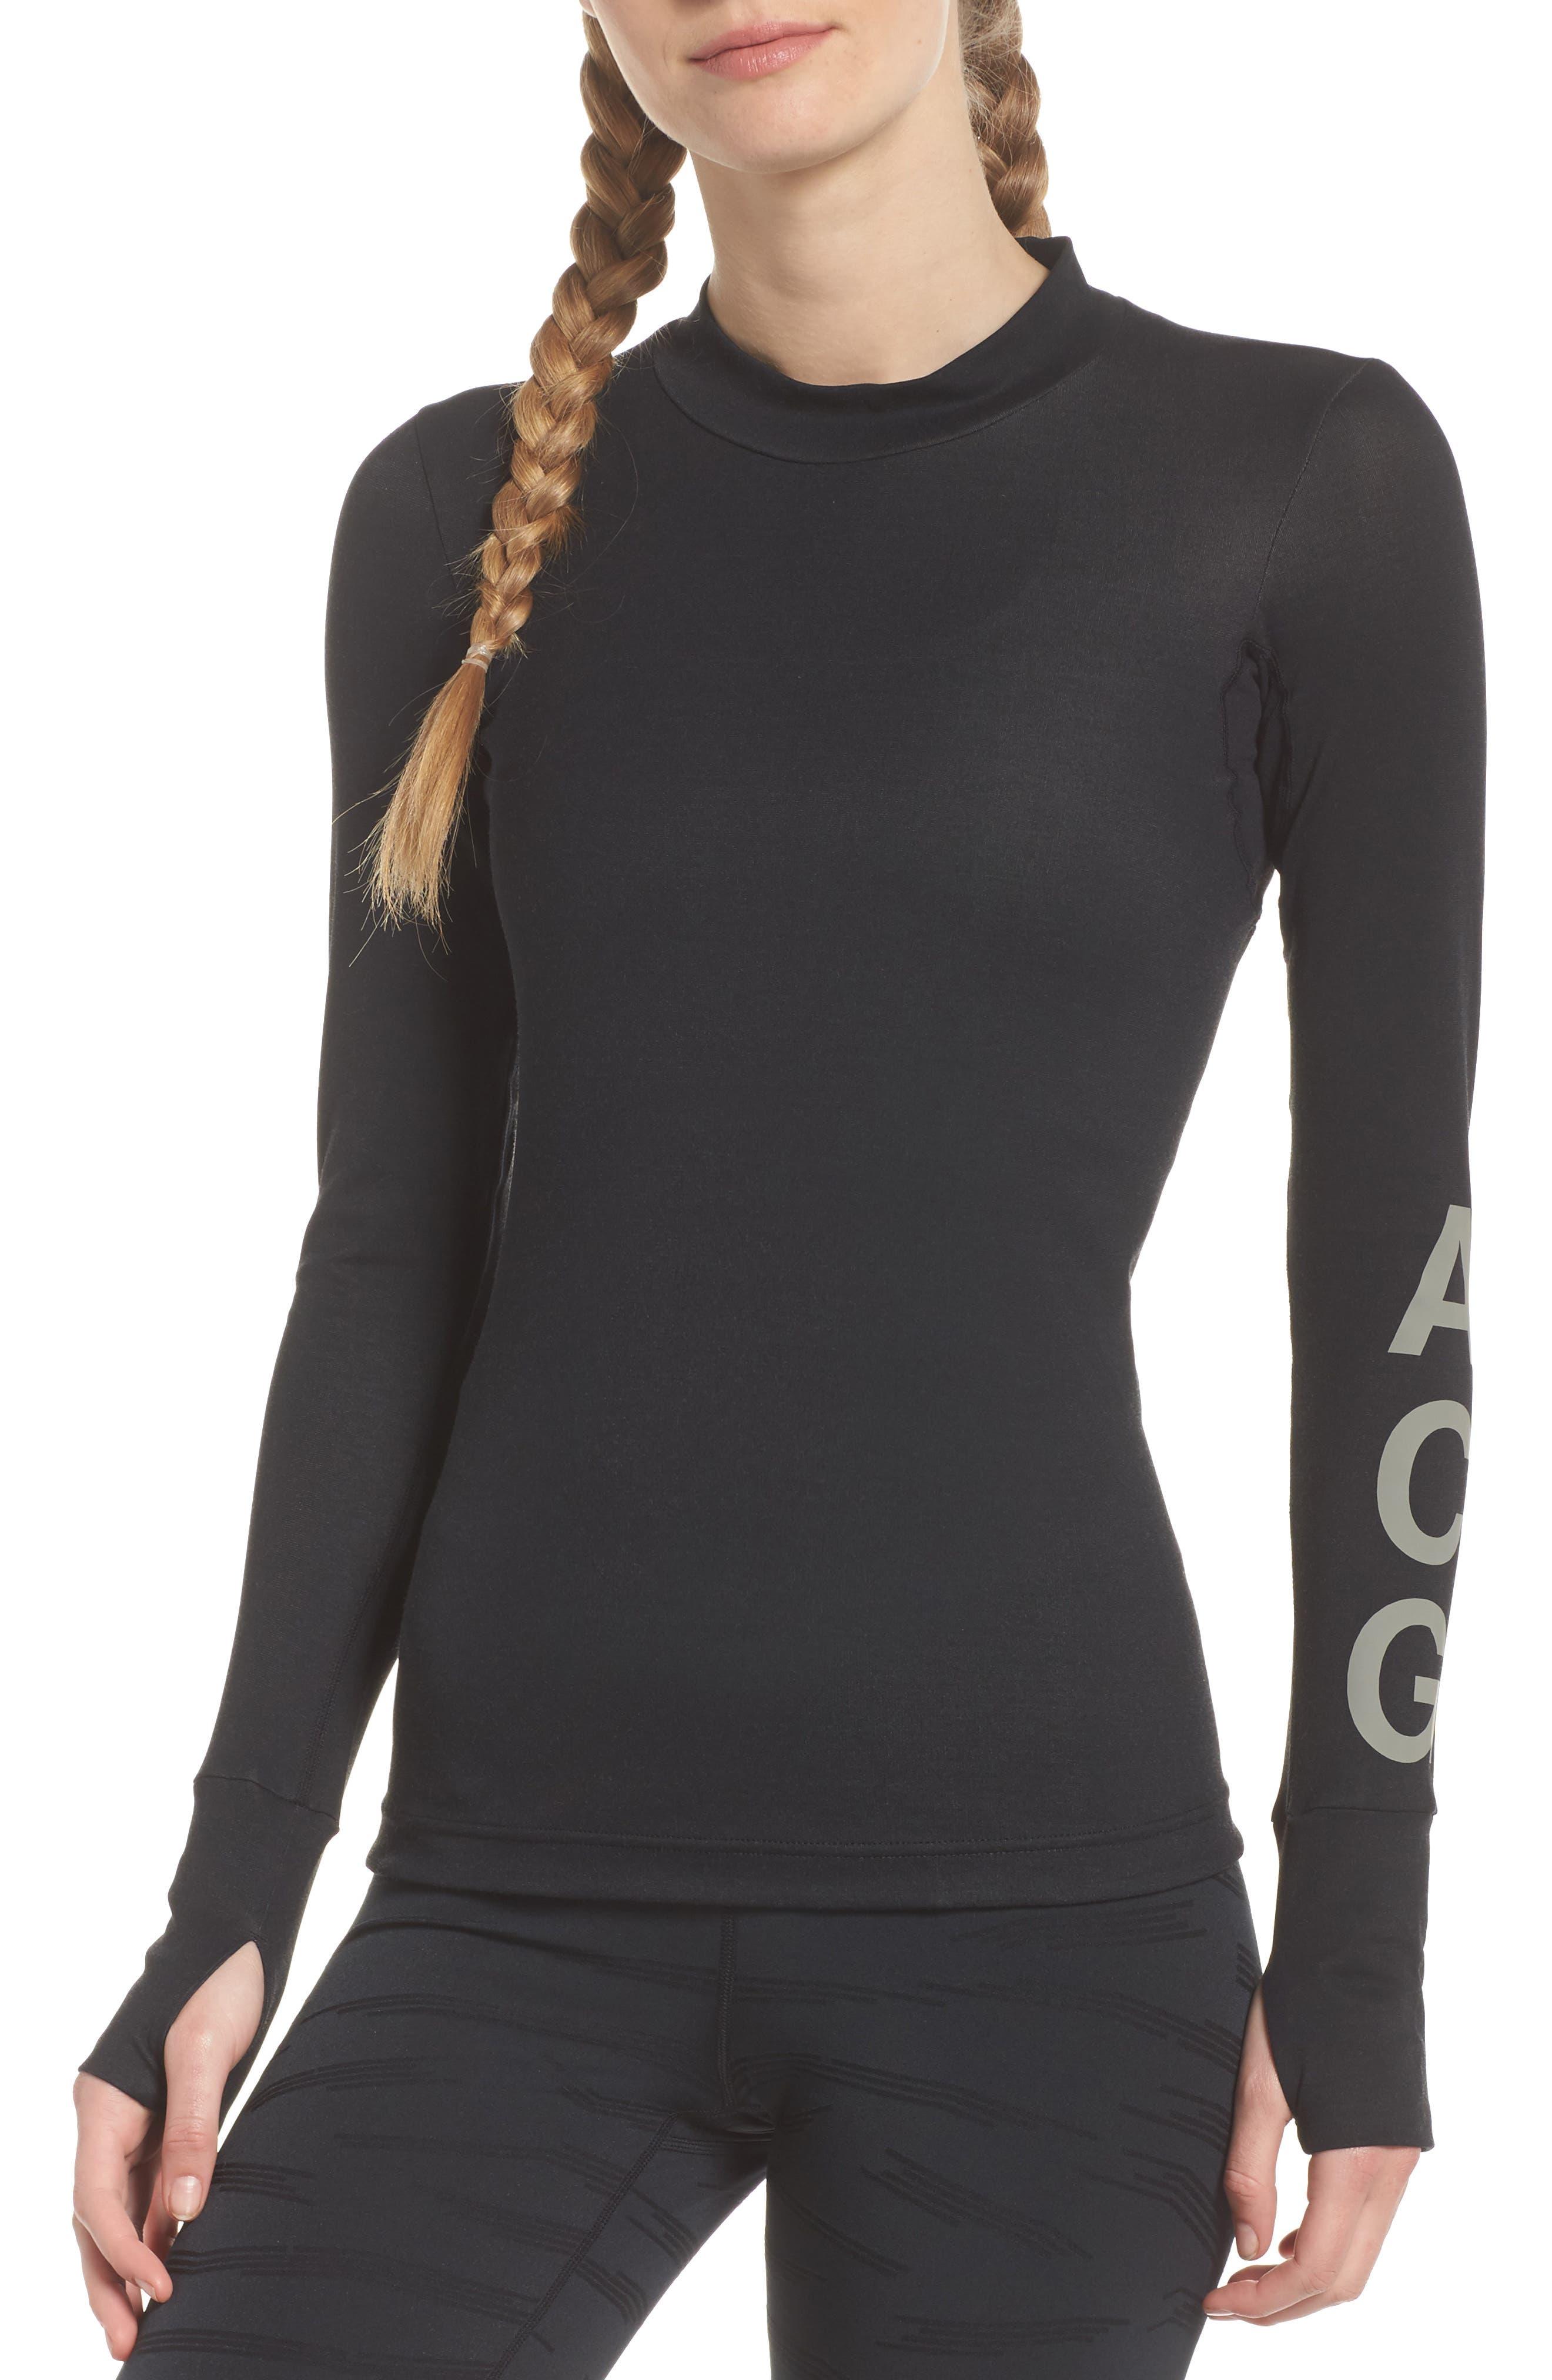 NikeLab ACG Long Sleeve Women's Top,                         Main,                         color, 010